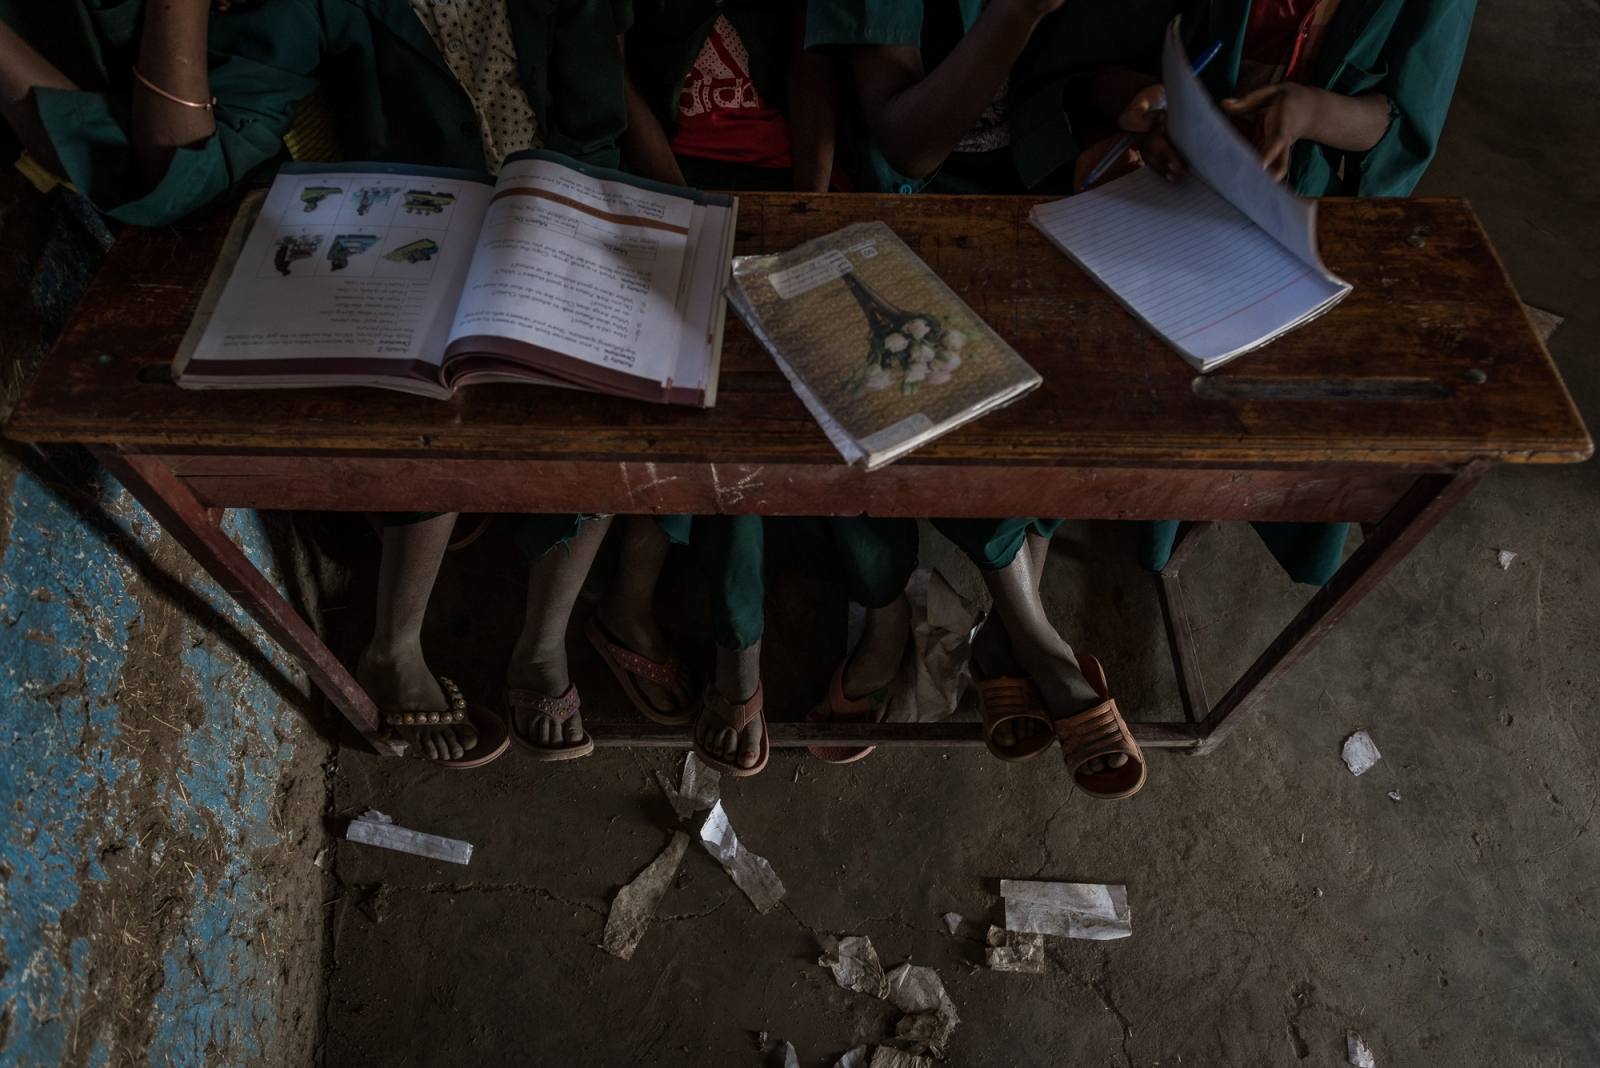 Art and Documentary Photography - Loading Occupation_girl_-_ignacio-marin.com-5.jpg